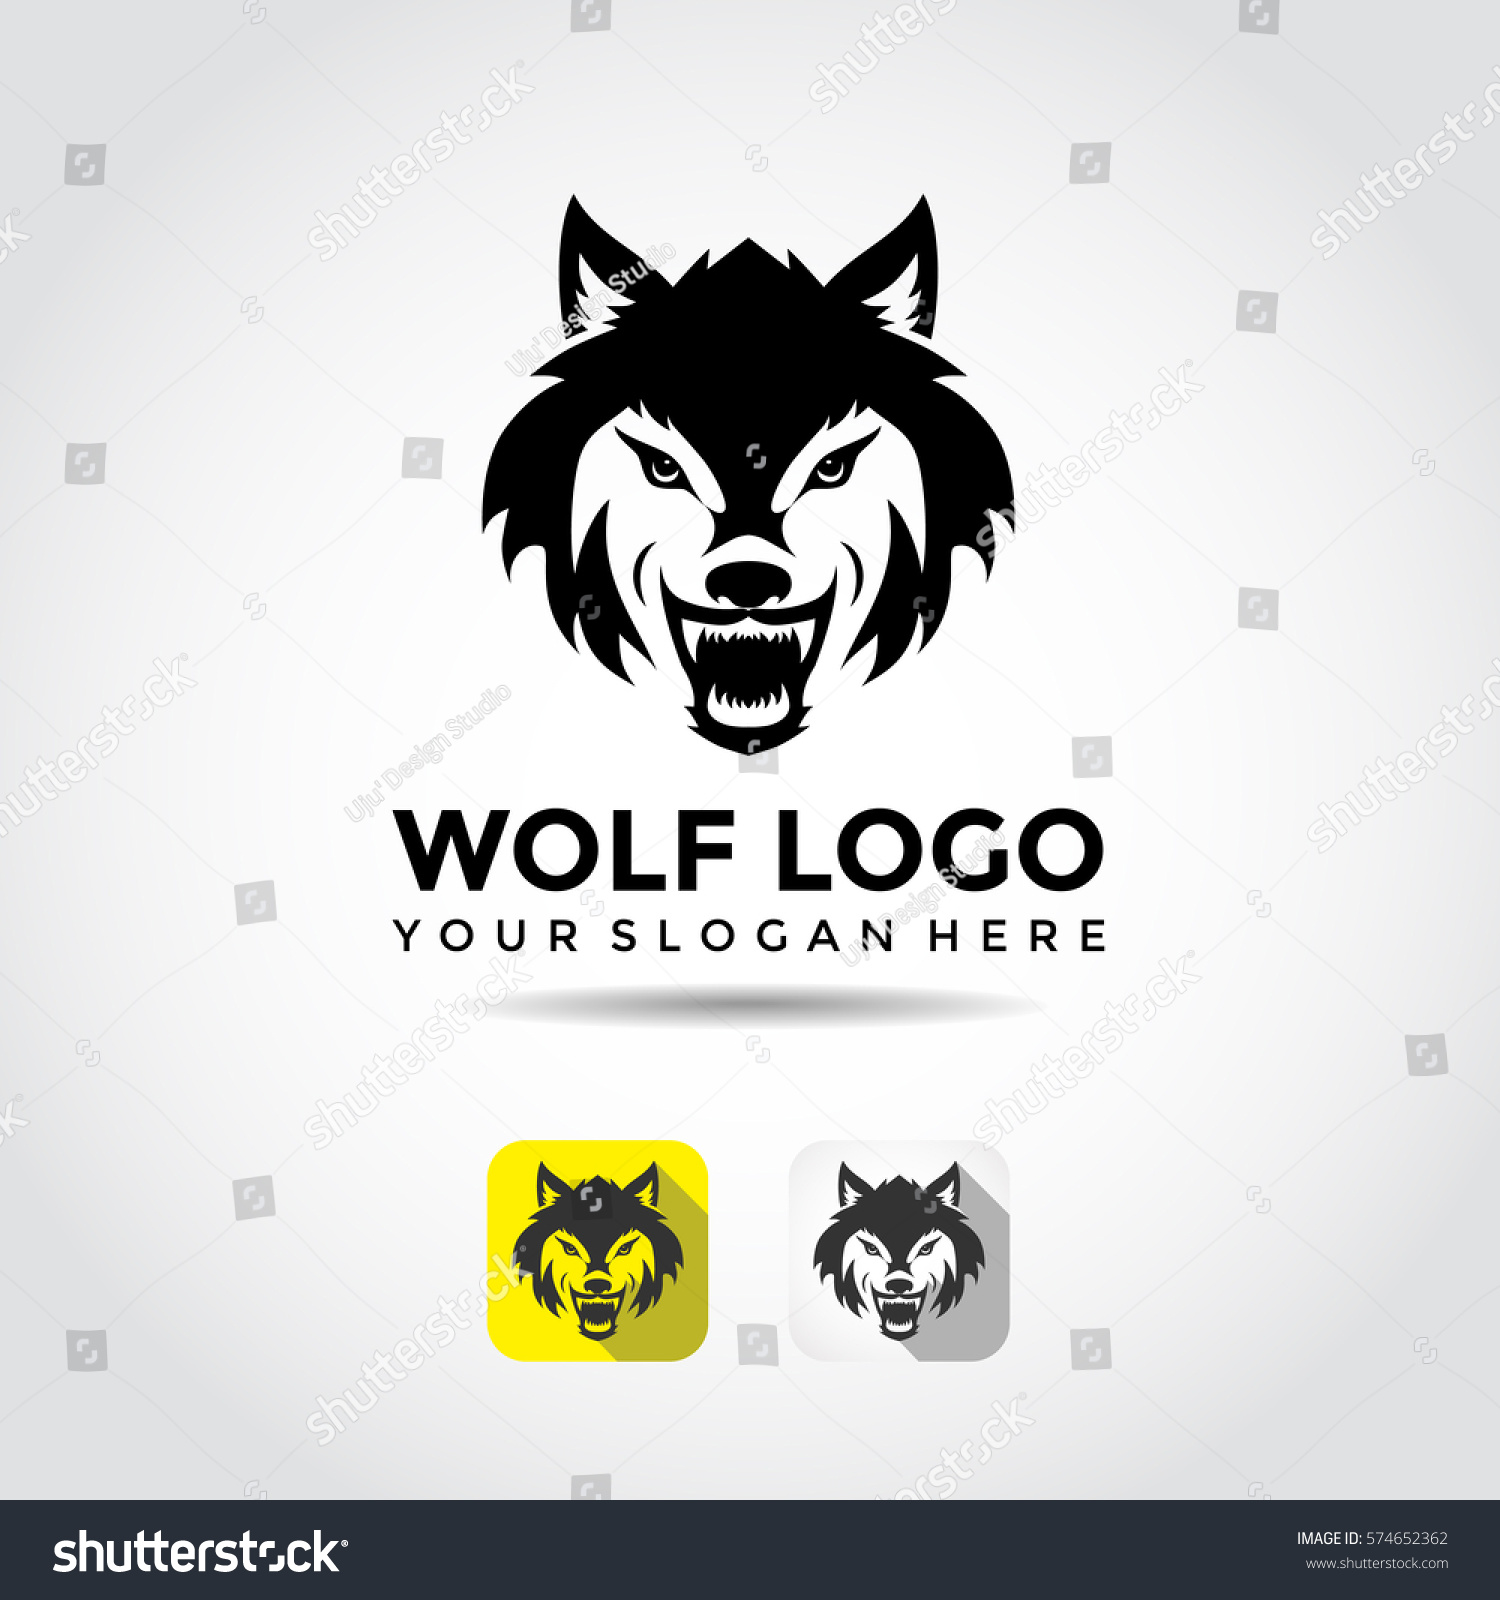 Wolf Logo Template Vector Illustrator Eps10 Stock Vector 574652362 ...